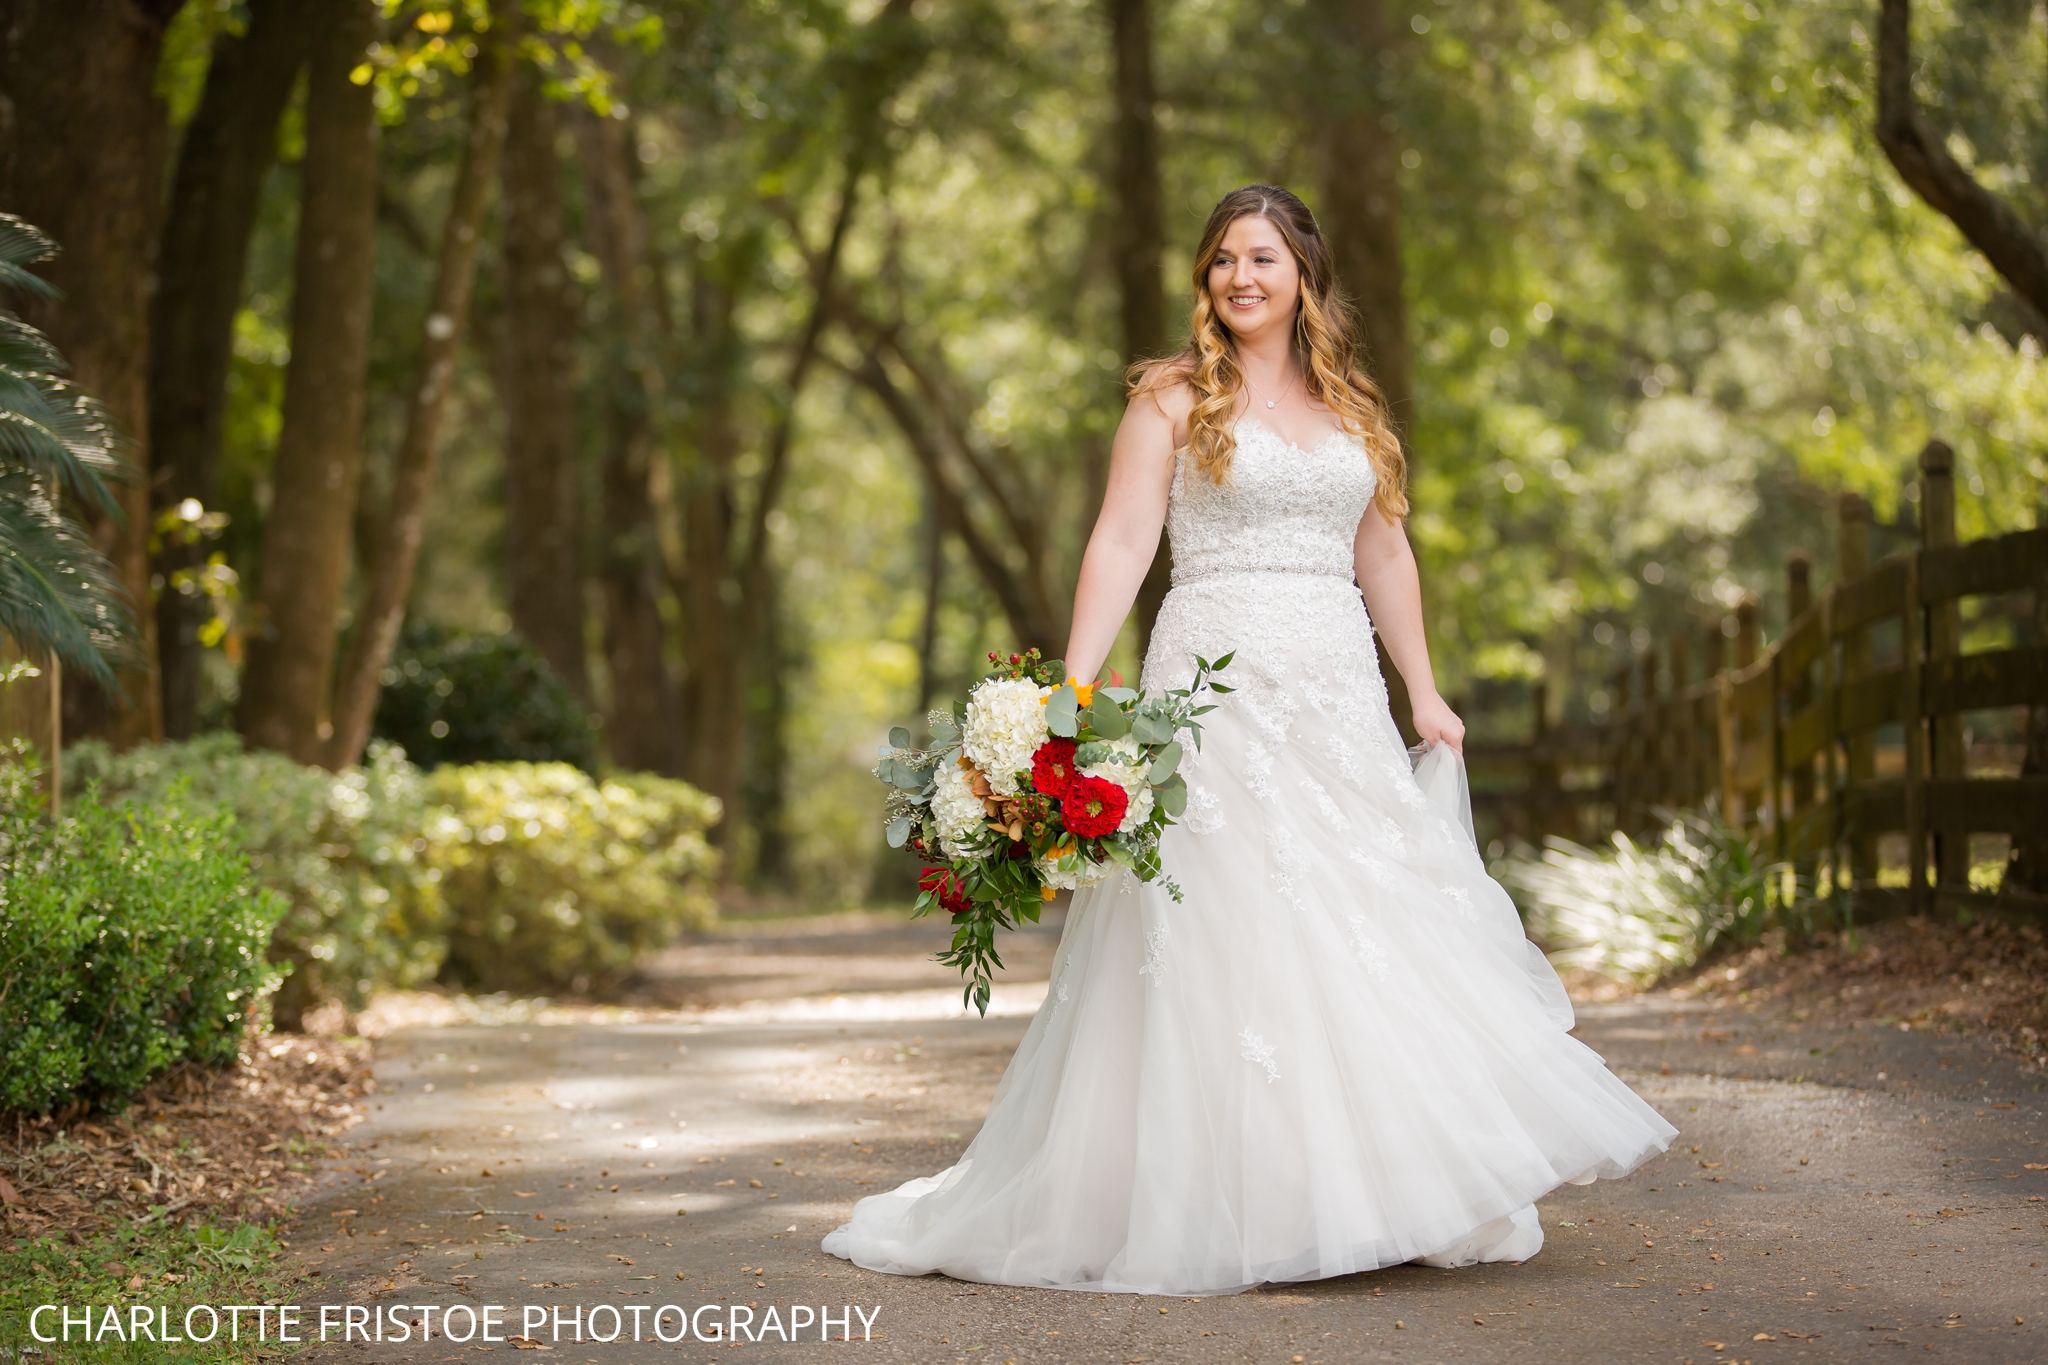 Tallahassee_Wedding_Charlotte_Fristoe-12.jpg